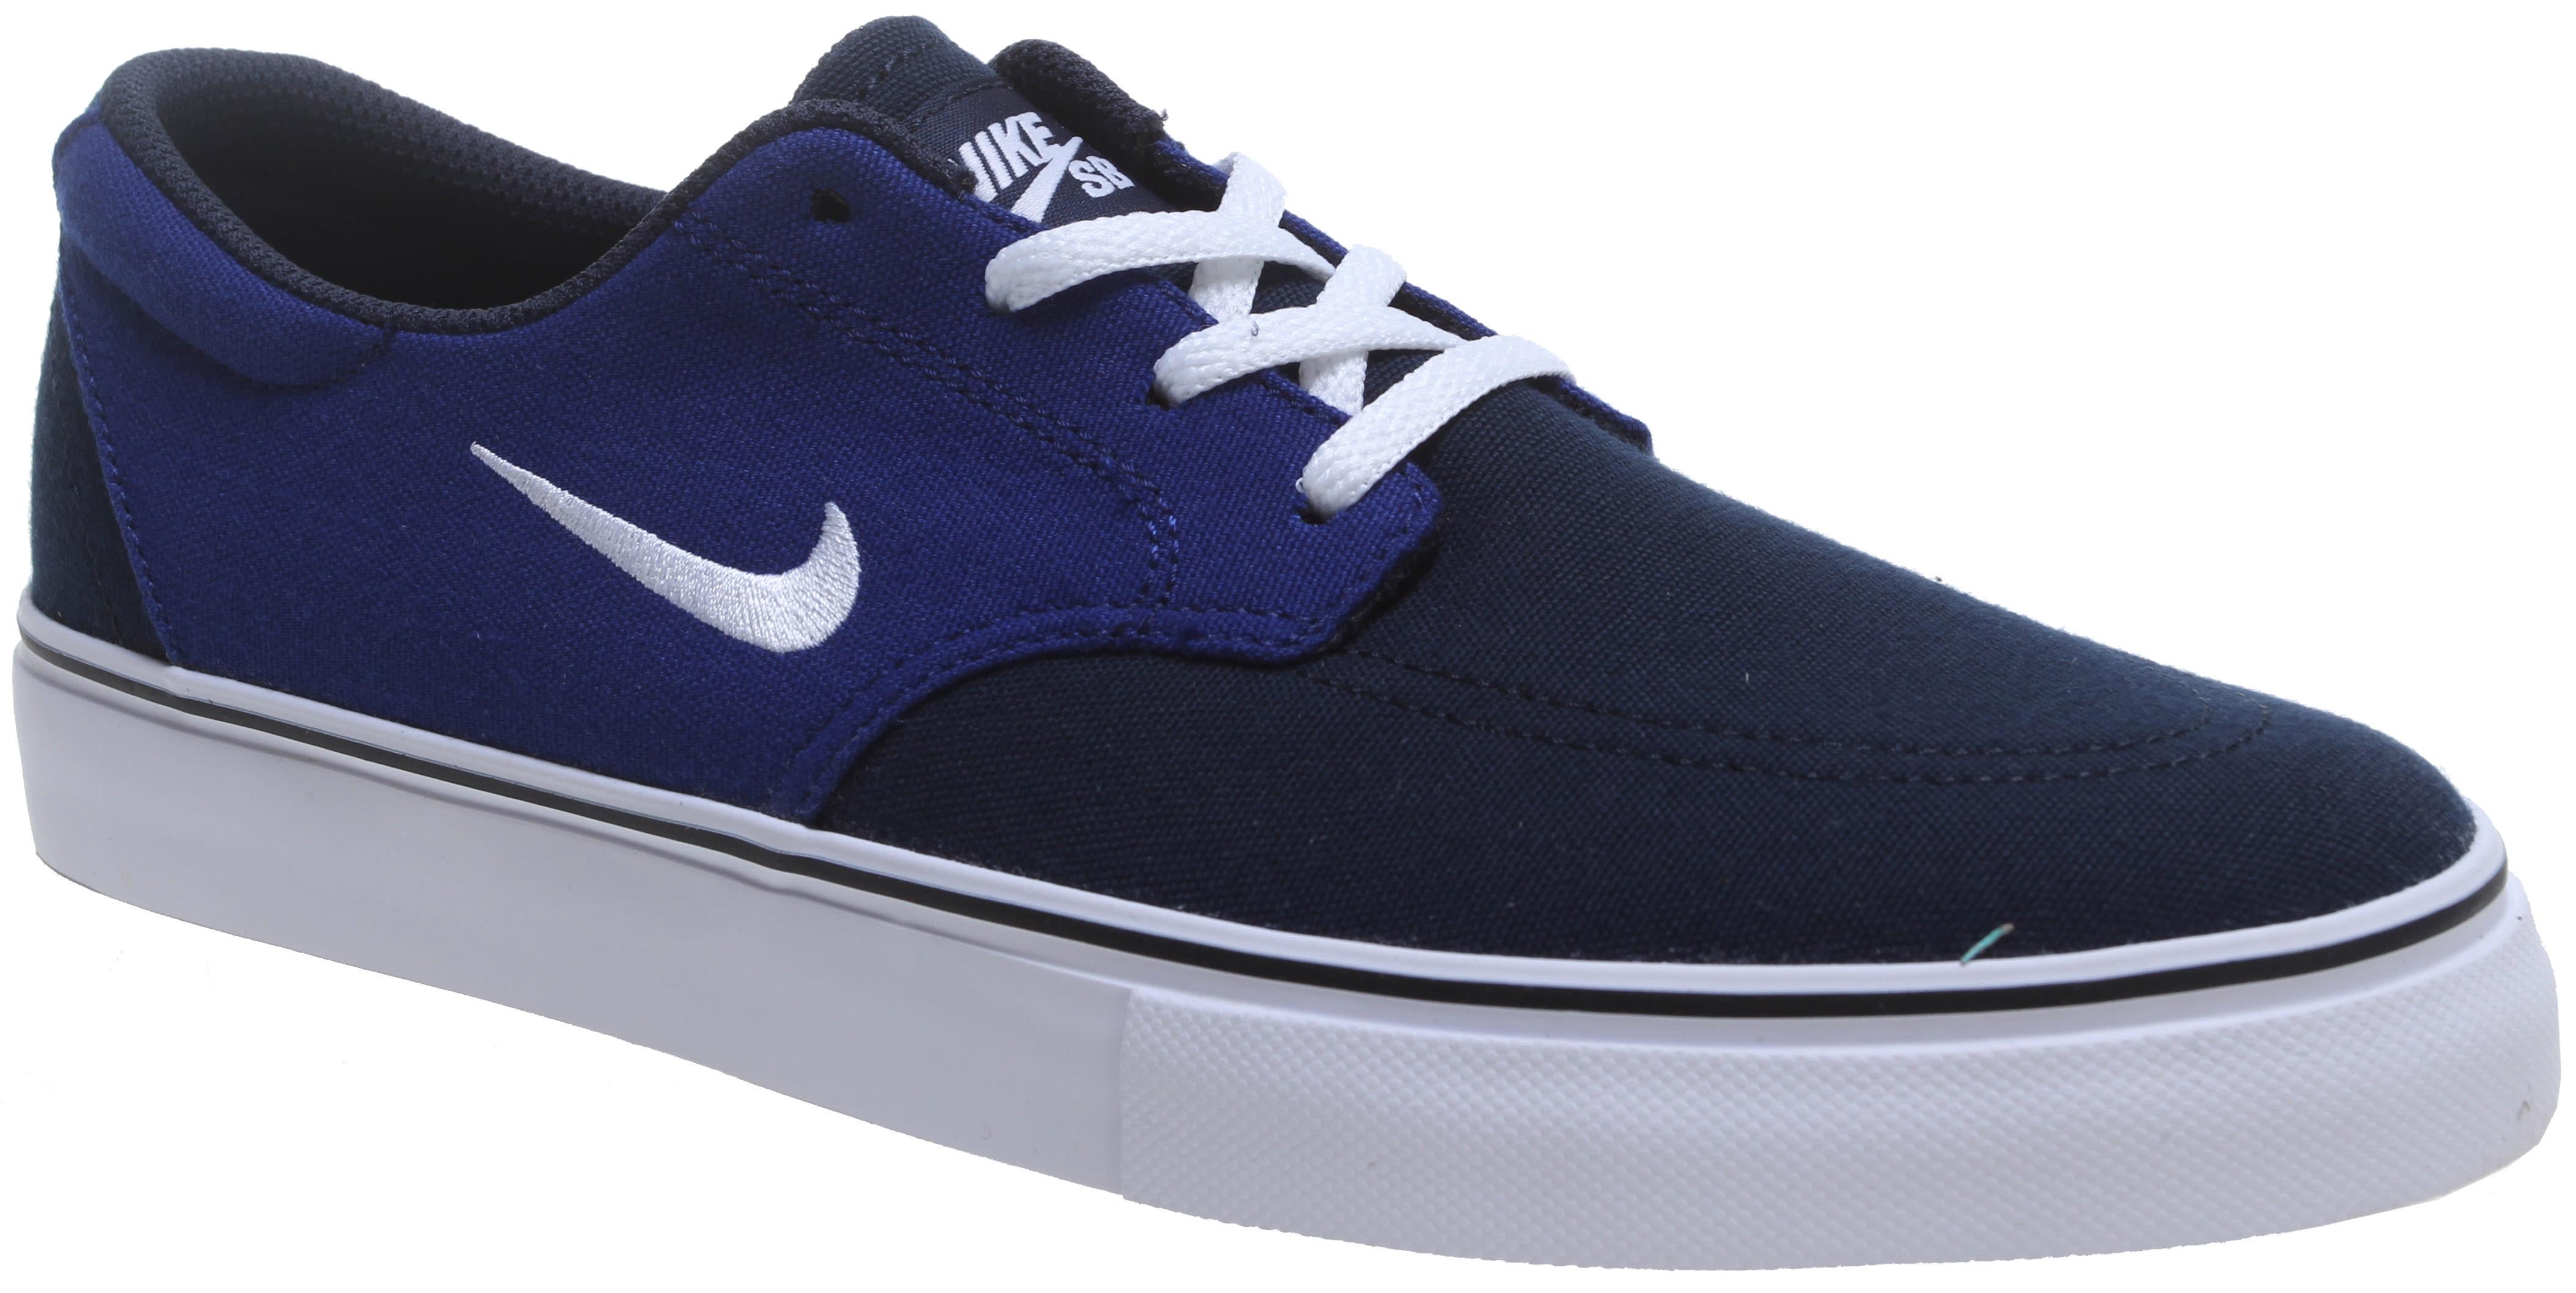 Nike skate shoes youth - Nike Sb Clutch Gs Skate Shoes Kids Youth